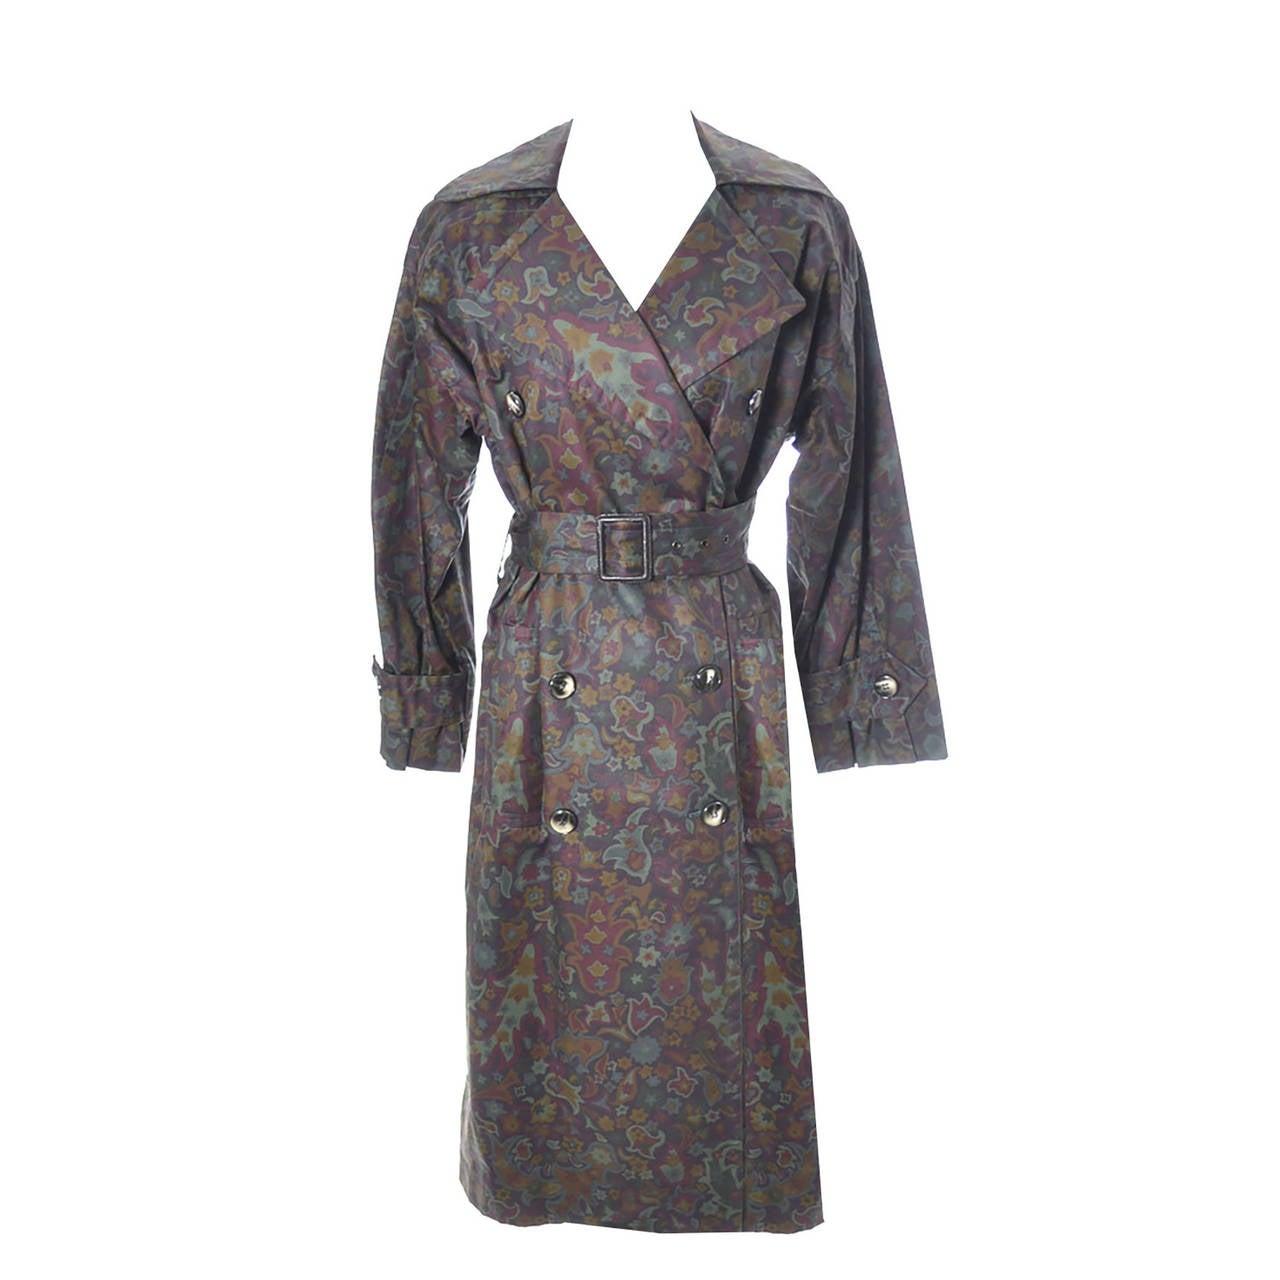 Yves Saint Laurent Rive Gauche Vintage YSL Raincoat Floral Pattern Trench Coat For Sale